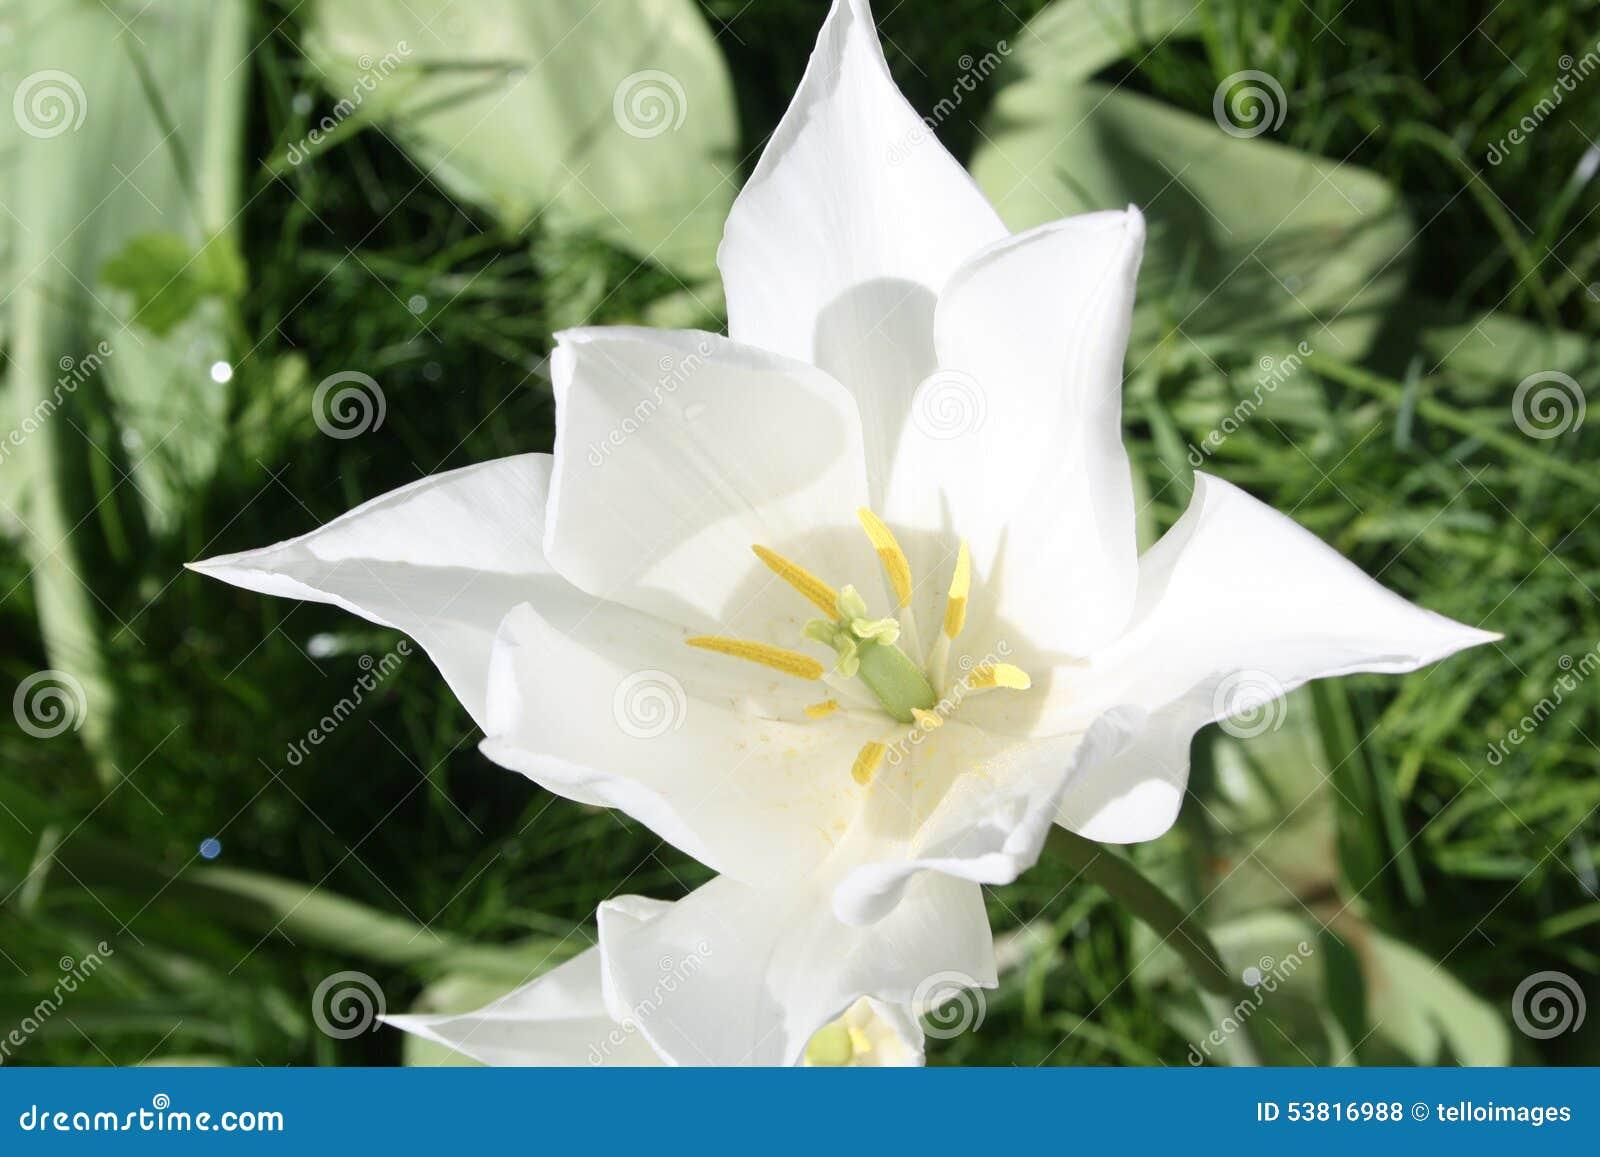 Fleur Tulipe Blanche Photo Stock Image Du Lumineux 53816988